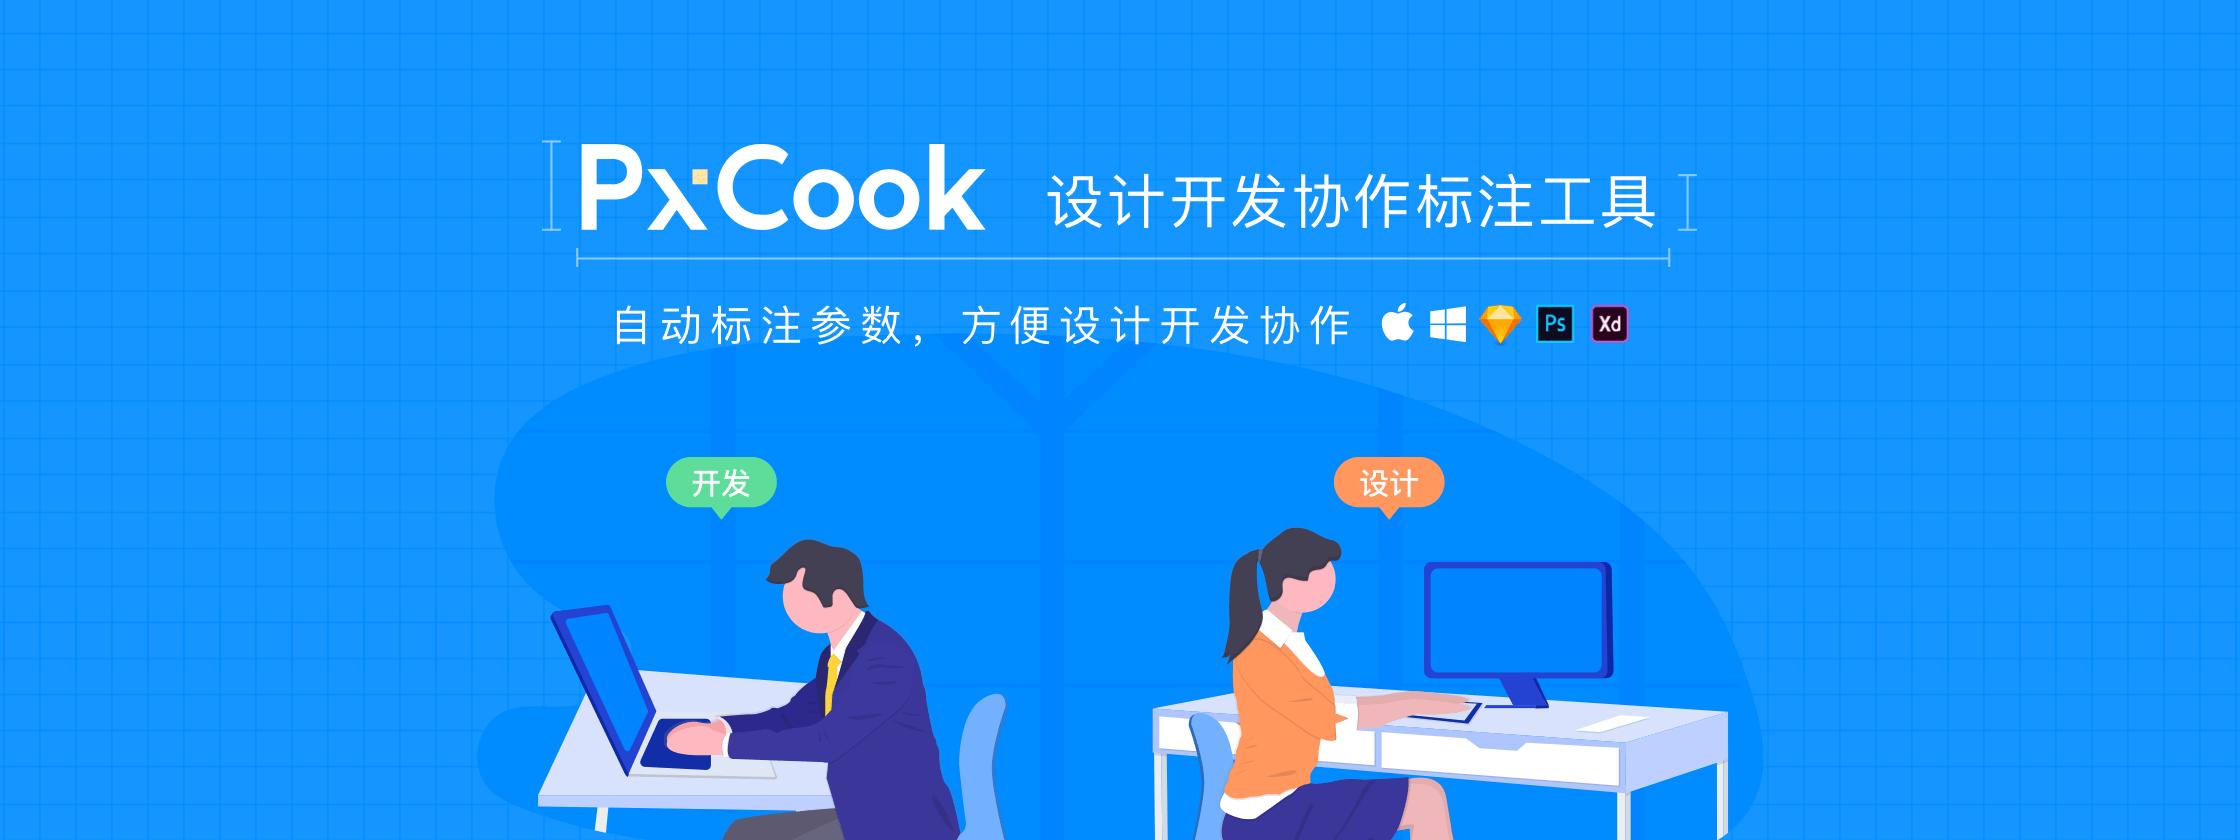 PxCook – 自动标注工具,开发设计协作利器